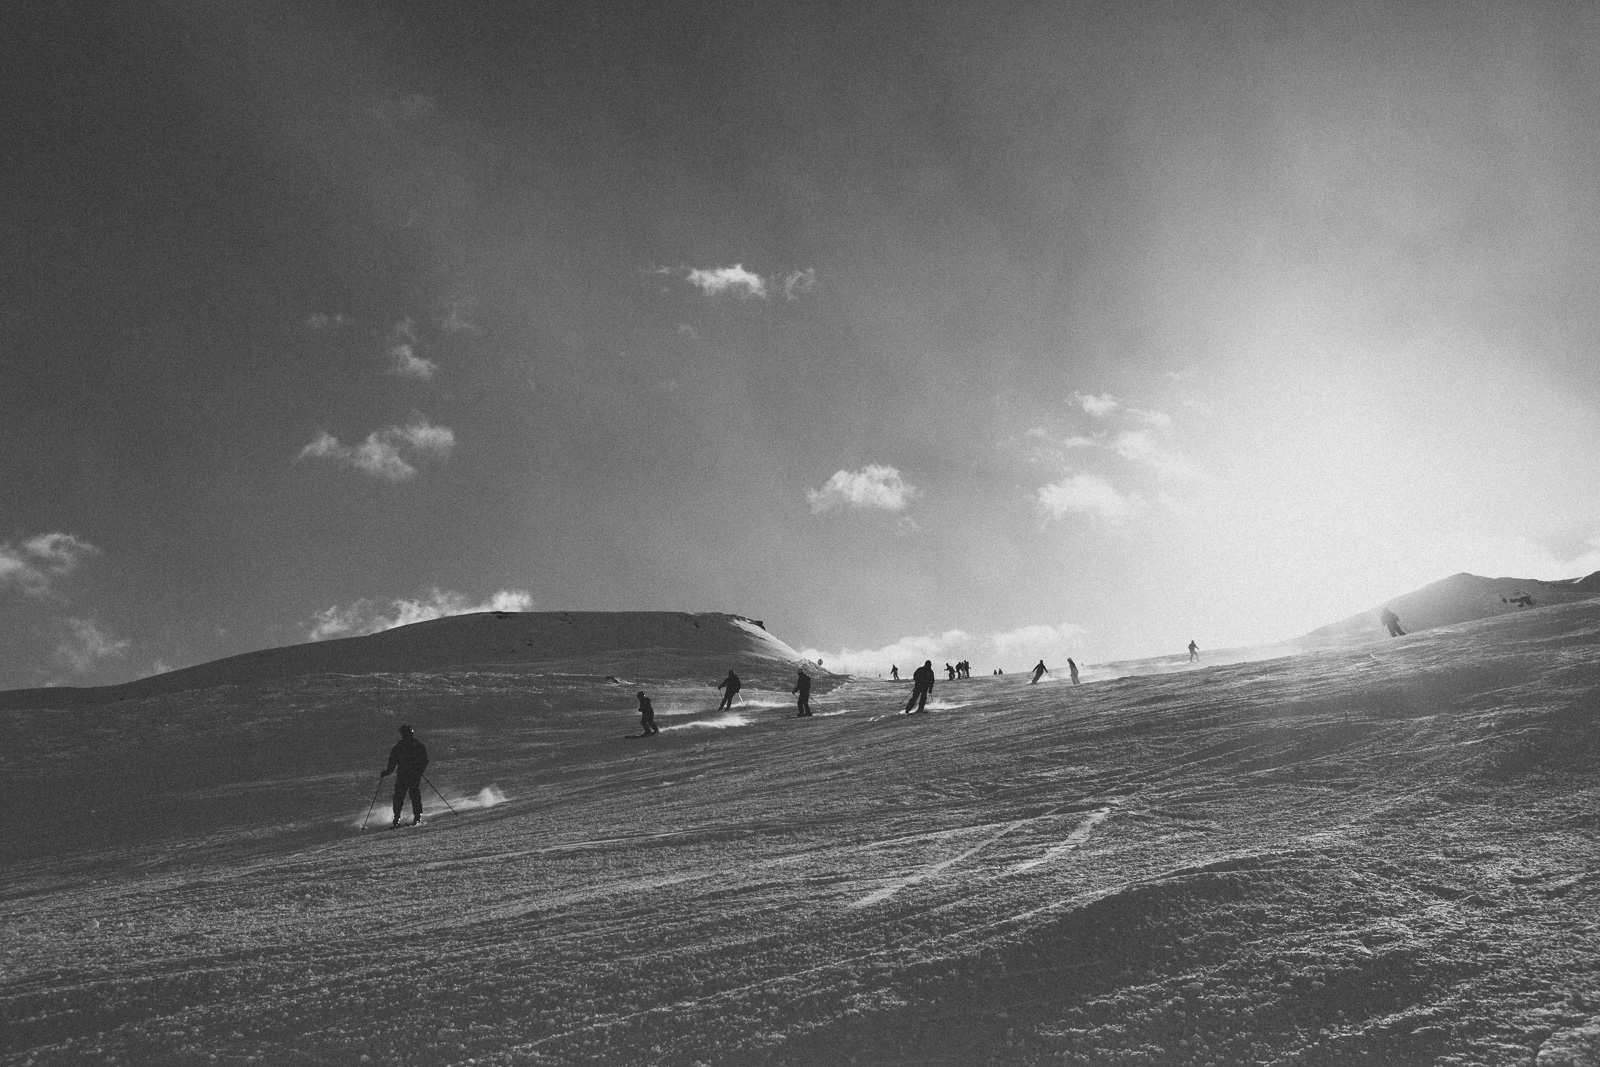 Evabloem_travel_wintersports_le-grande-massif-0012.jpg